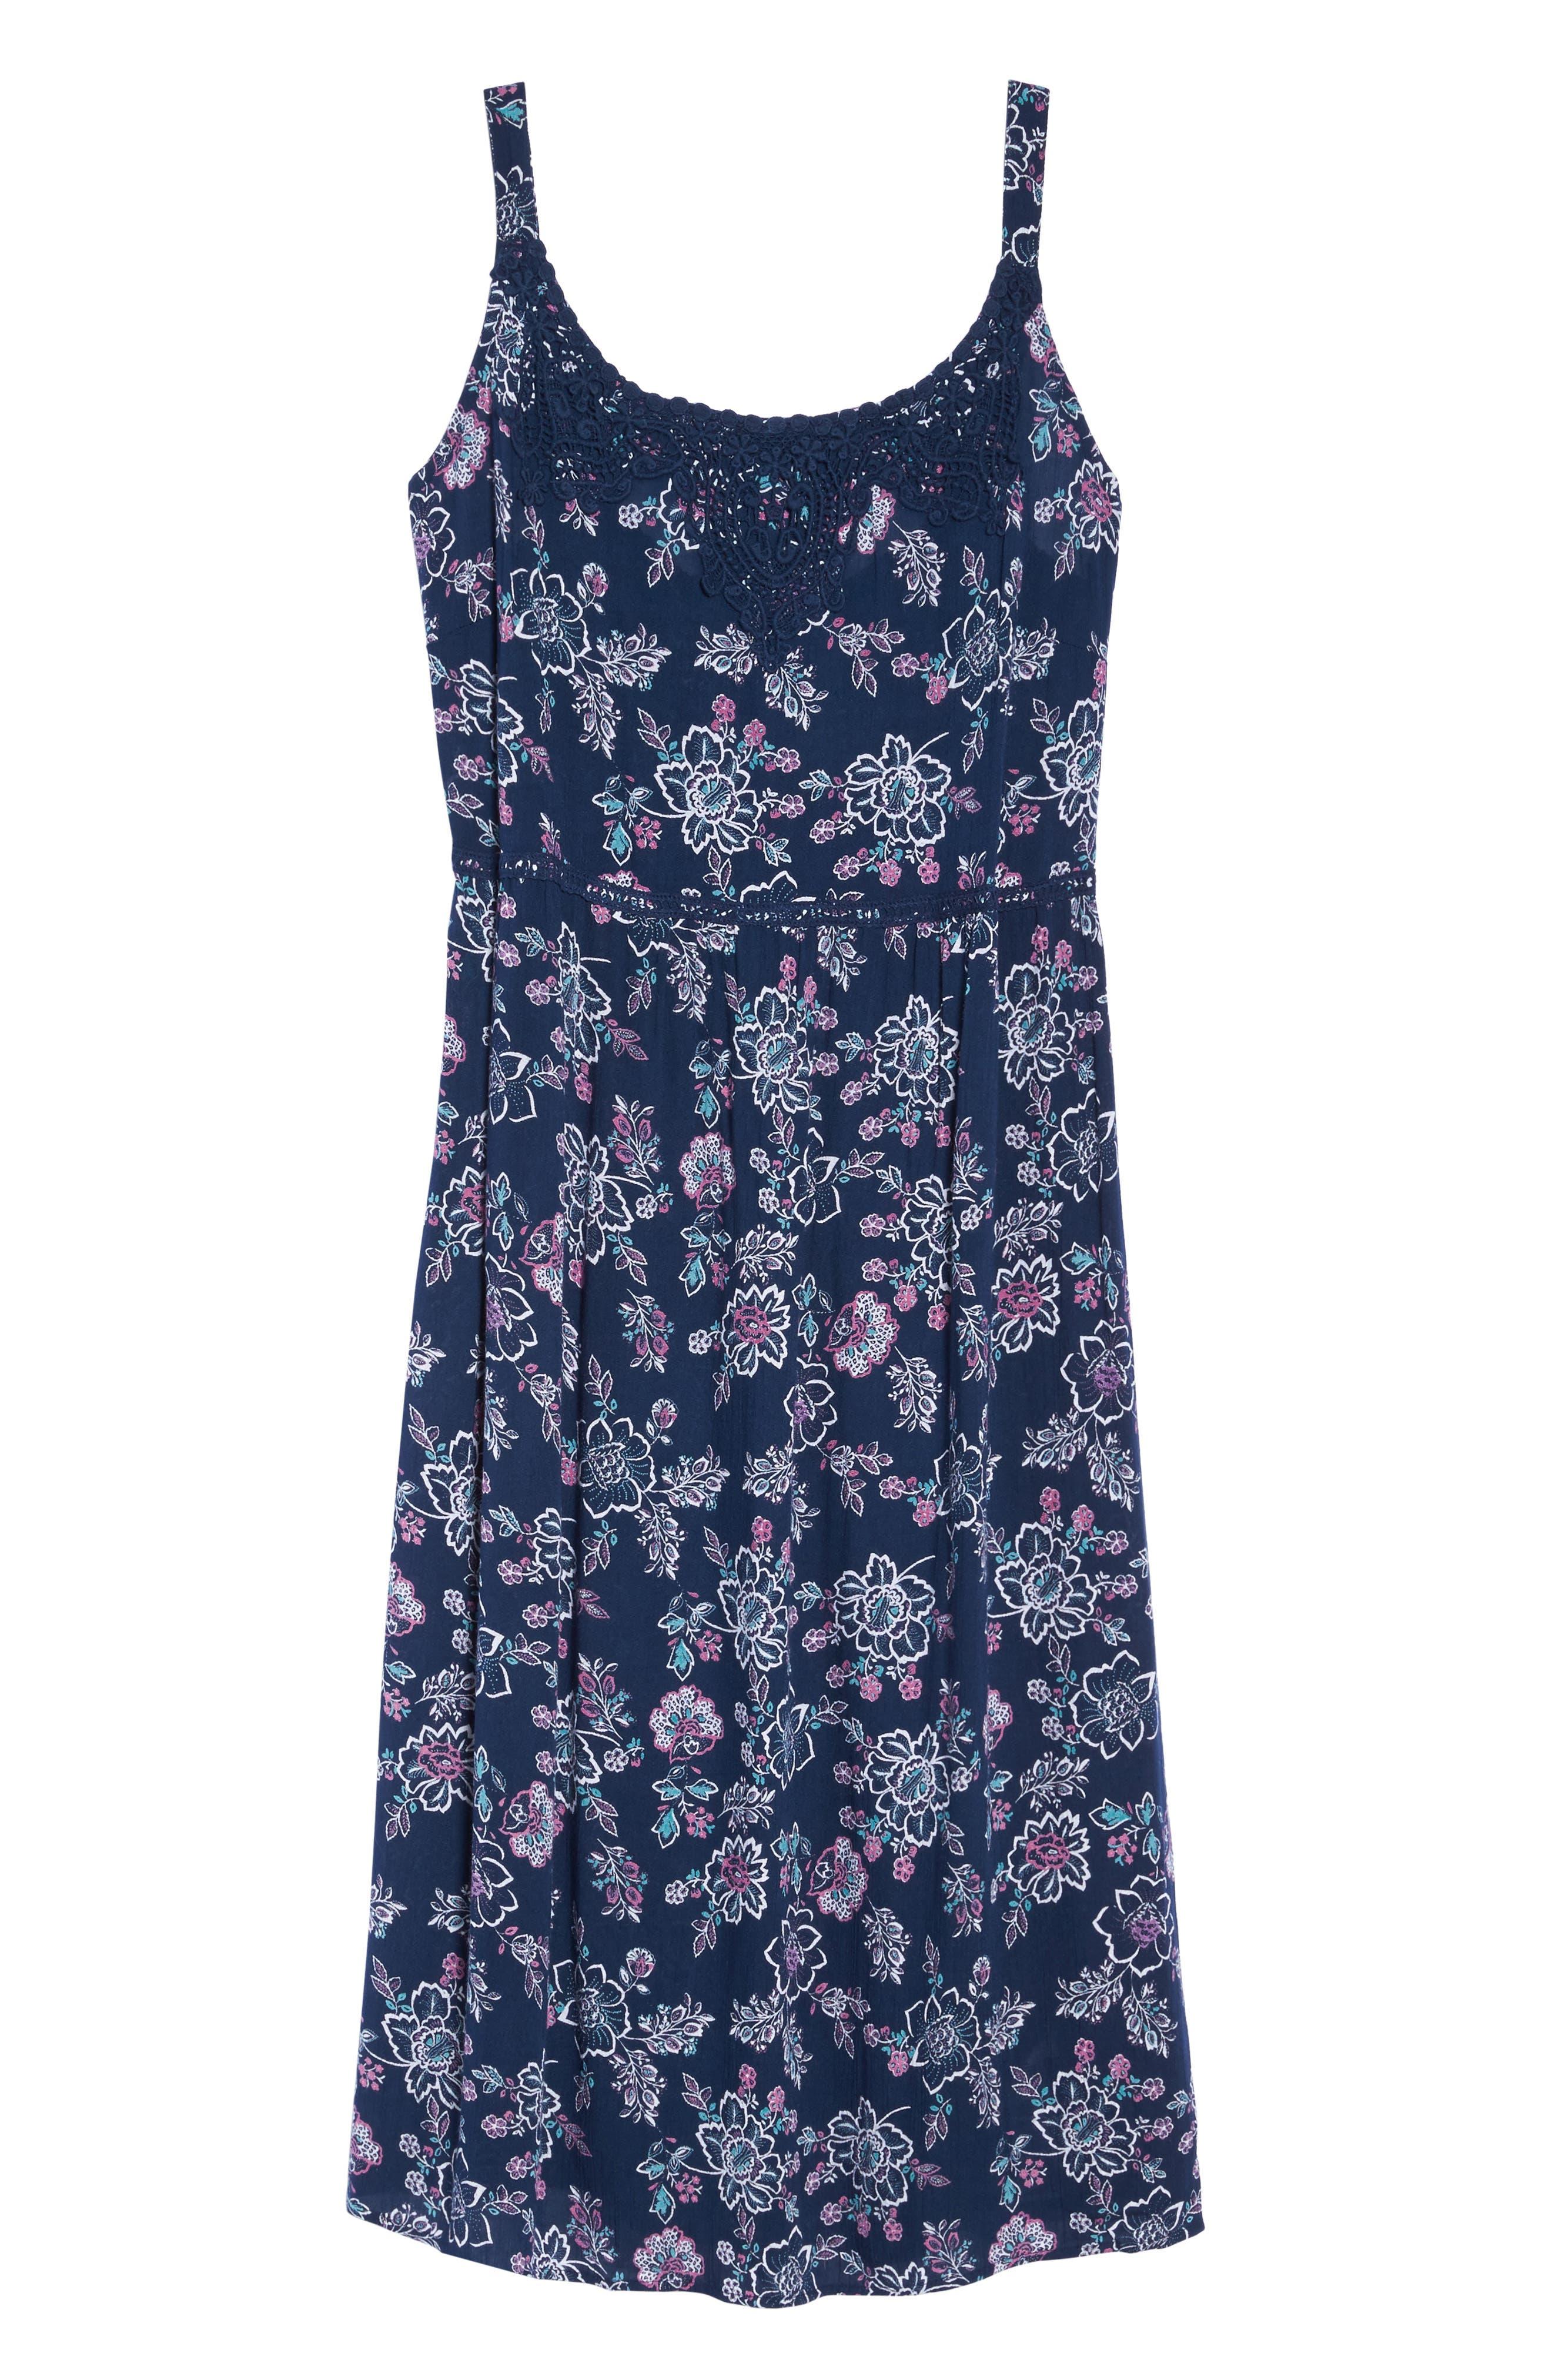 Floral Print Crochet Trim Dress,                             Alternate thumbnail 6, color,                             Navy